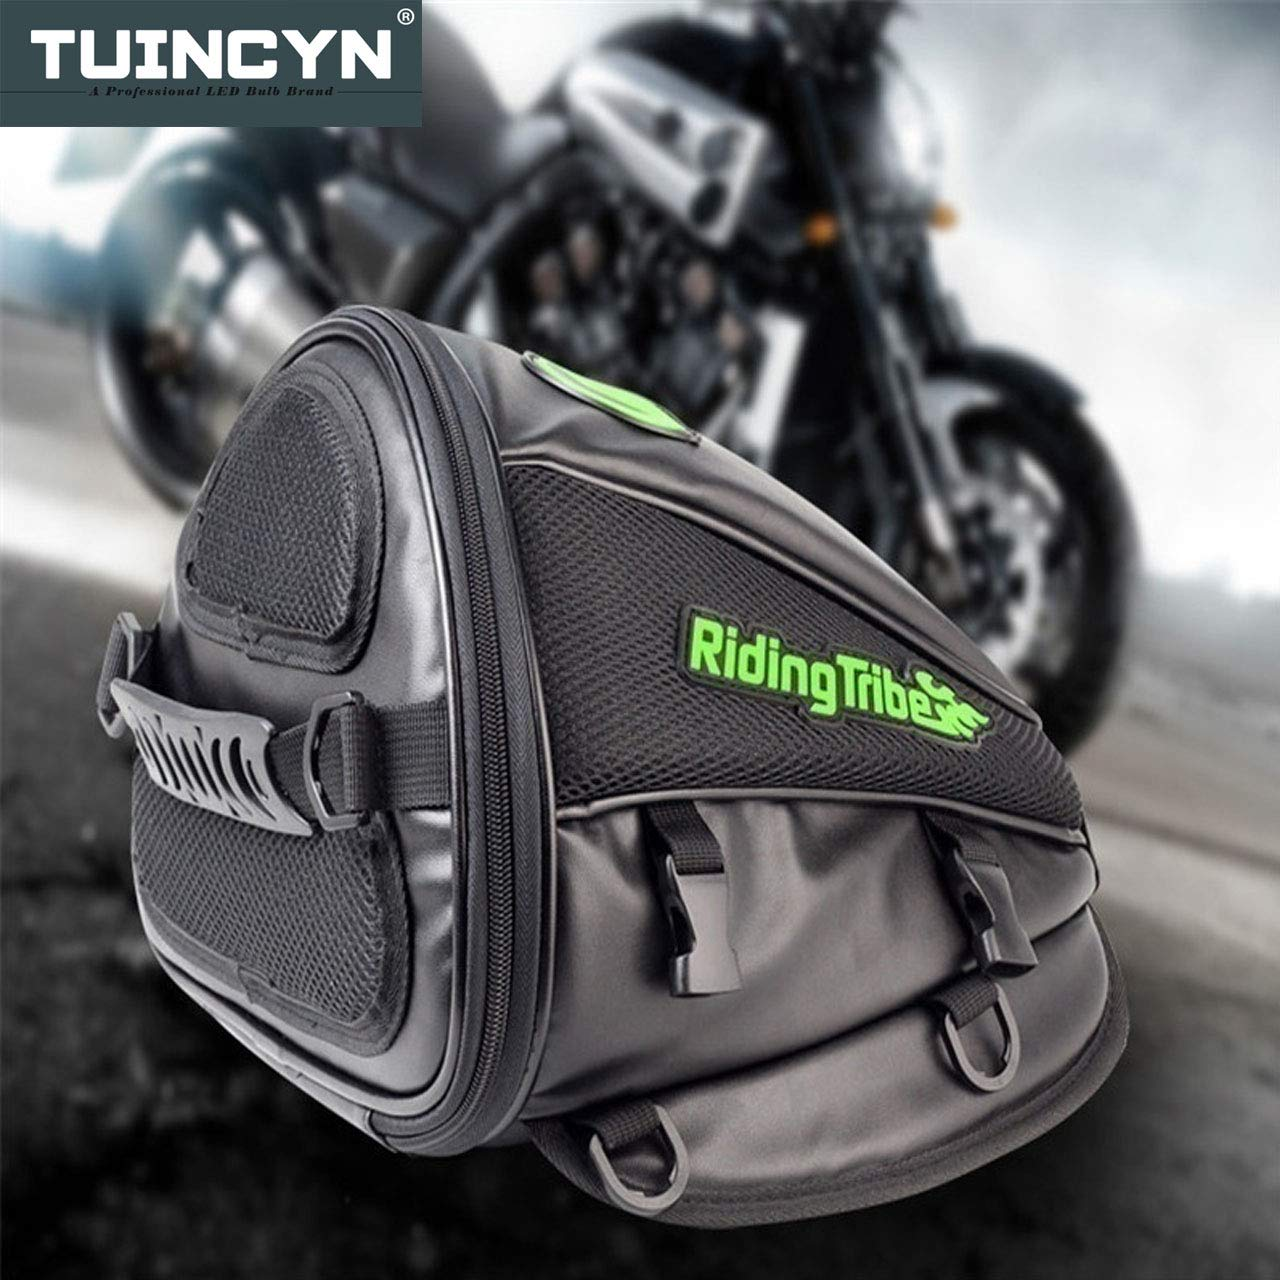 TUINCYN Motorcycle Backrest Saddle Storage Bag Multifunctional Large Capacity Waterproof PU Leather Tank Bag Motorbike Rear Seat Light Tail Bag.